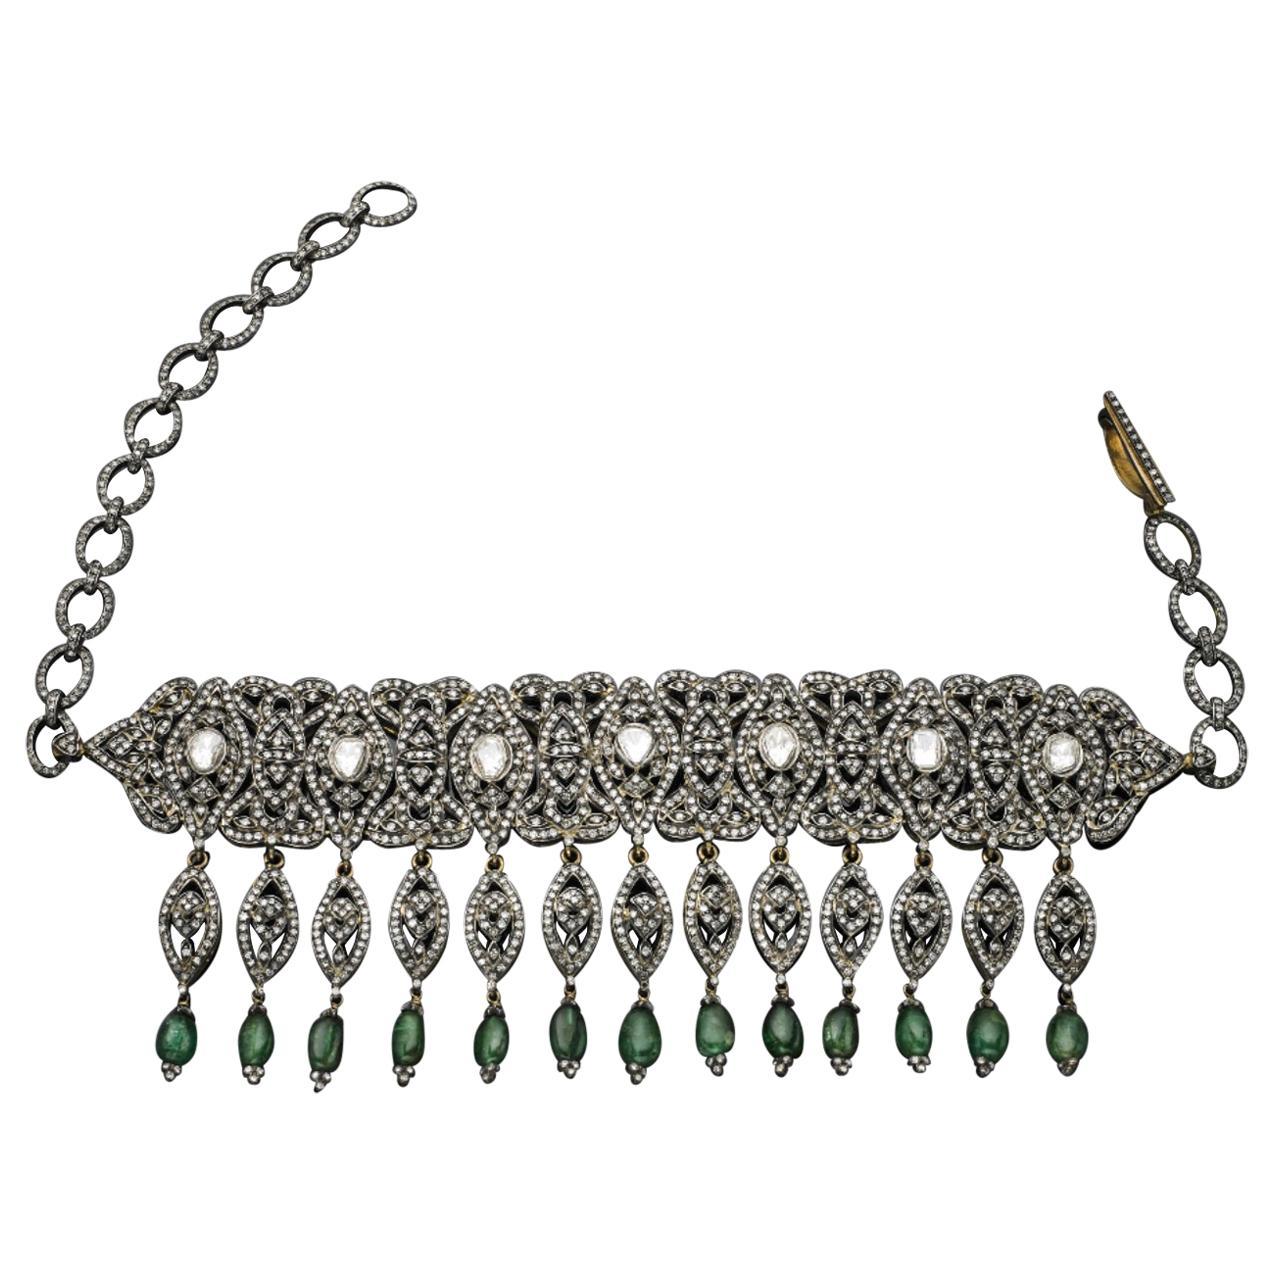 Emerald Diamond Choker Necklace